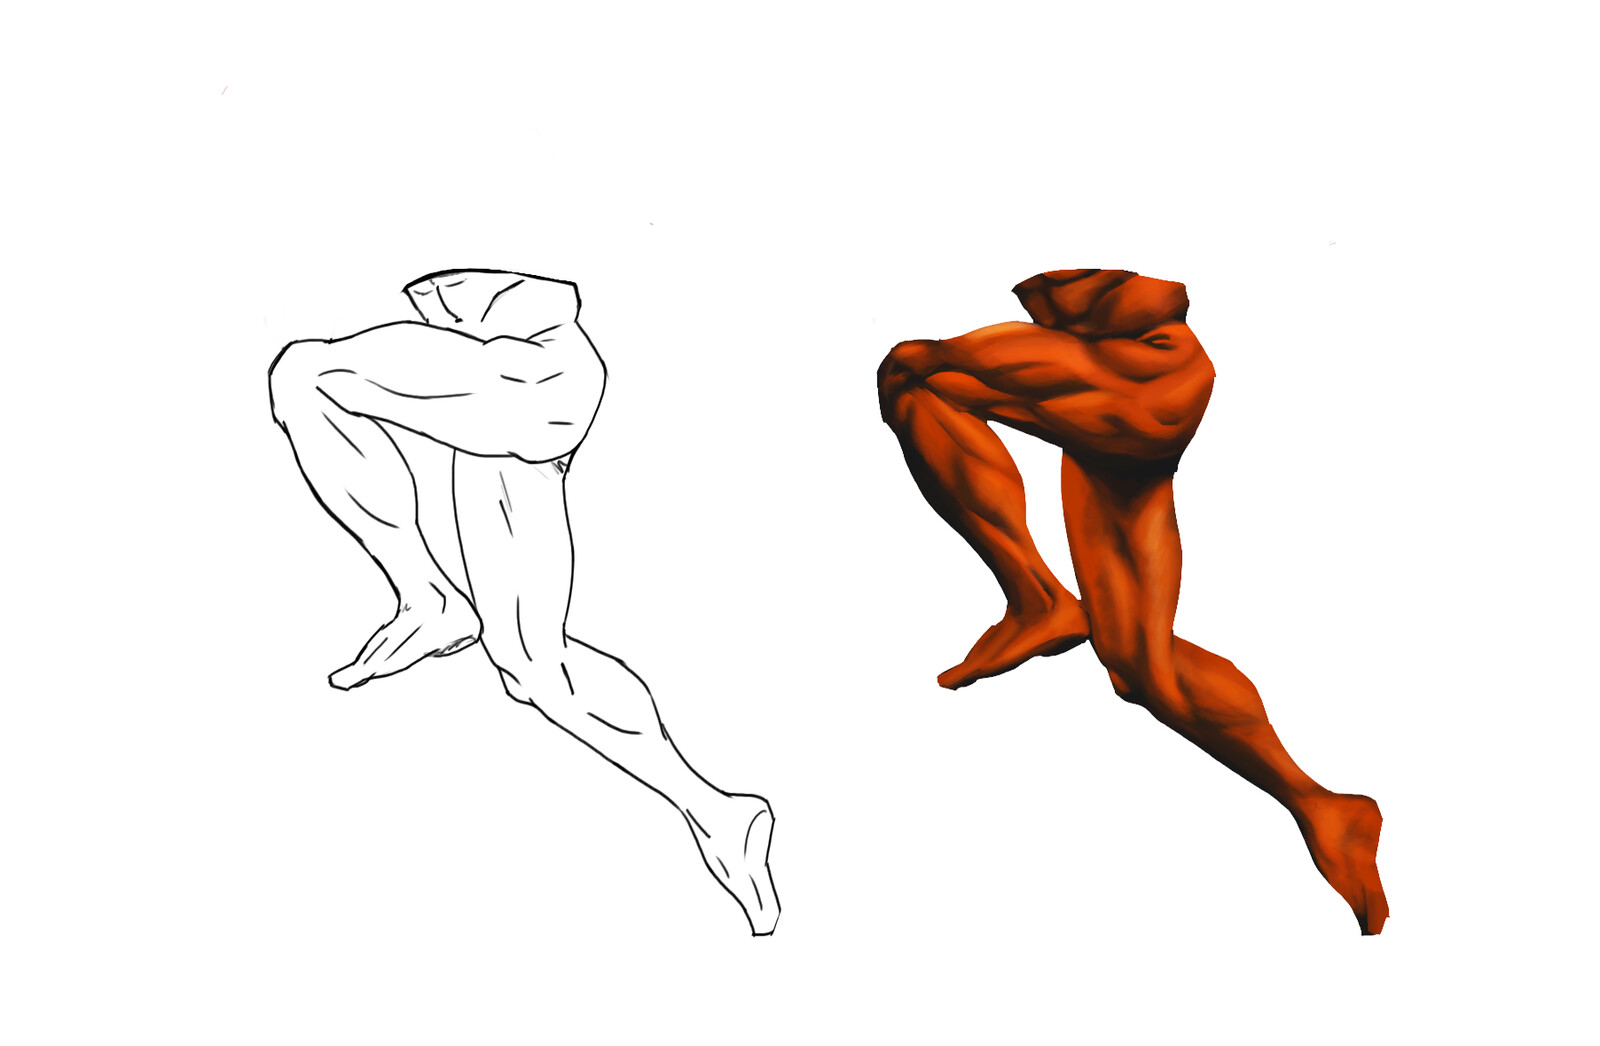 Shading leg muscles